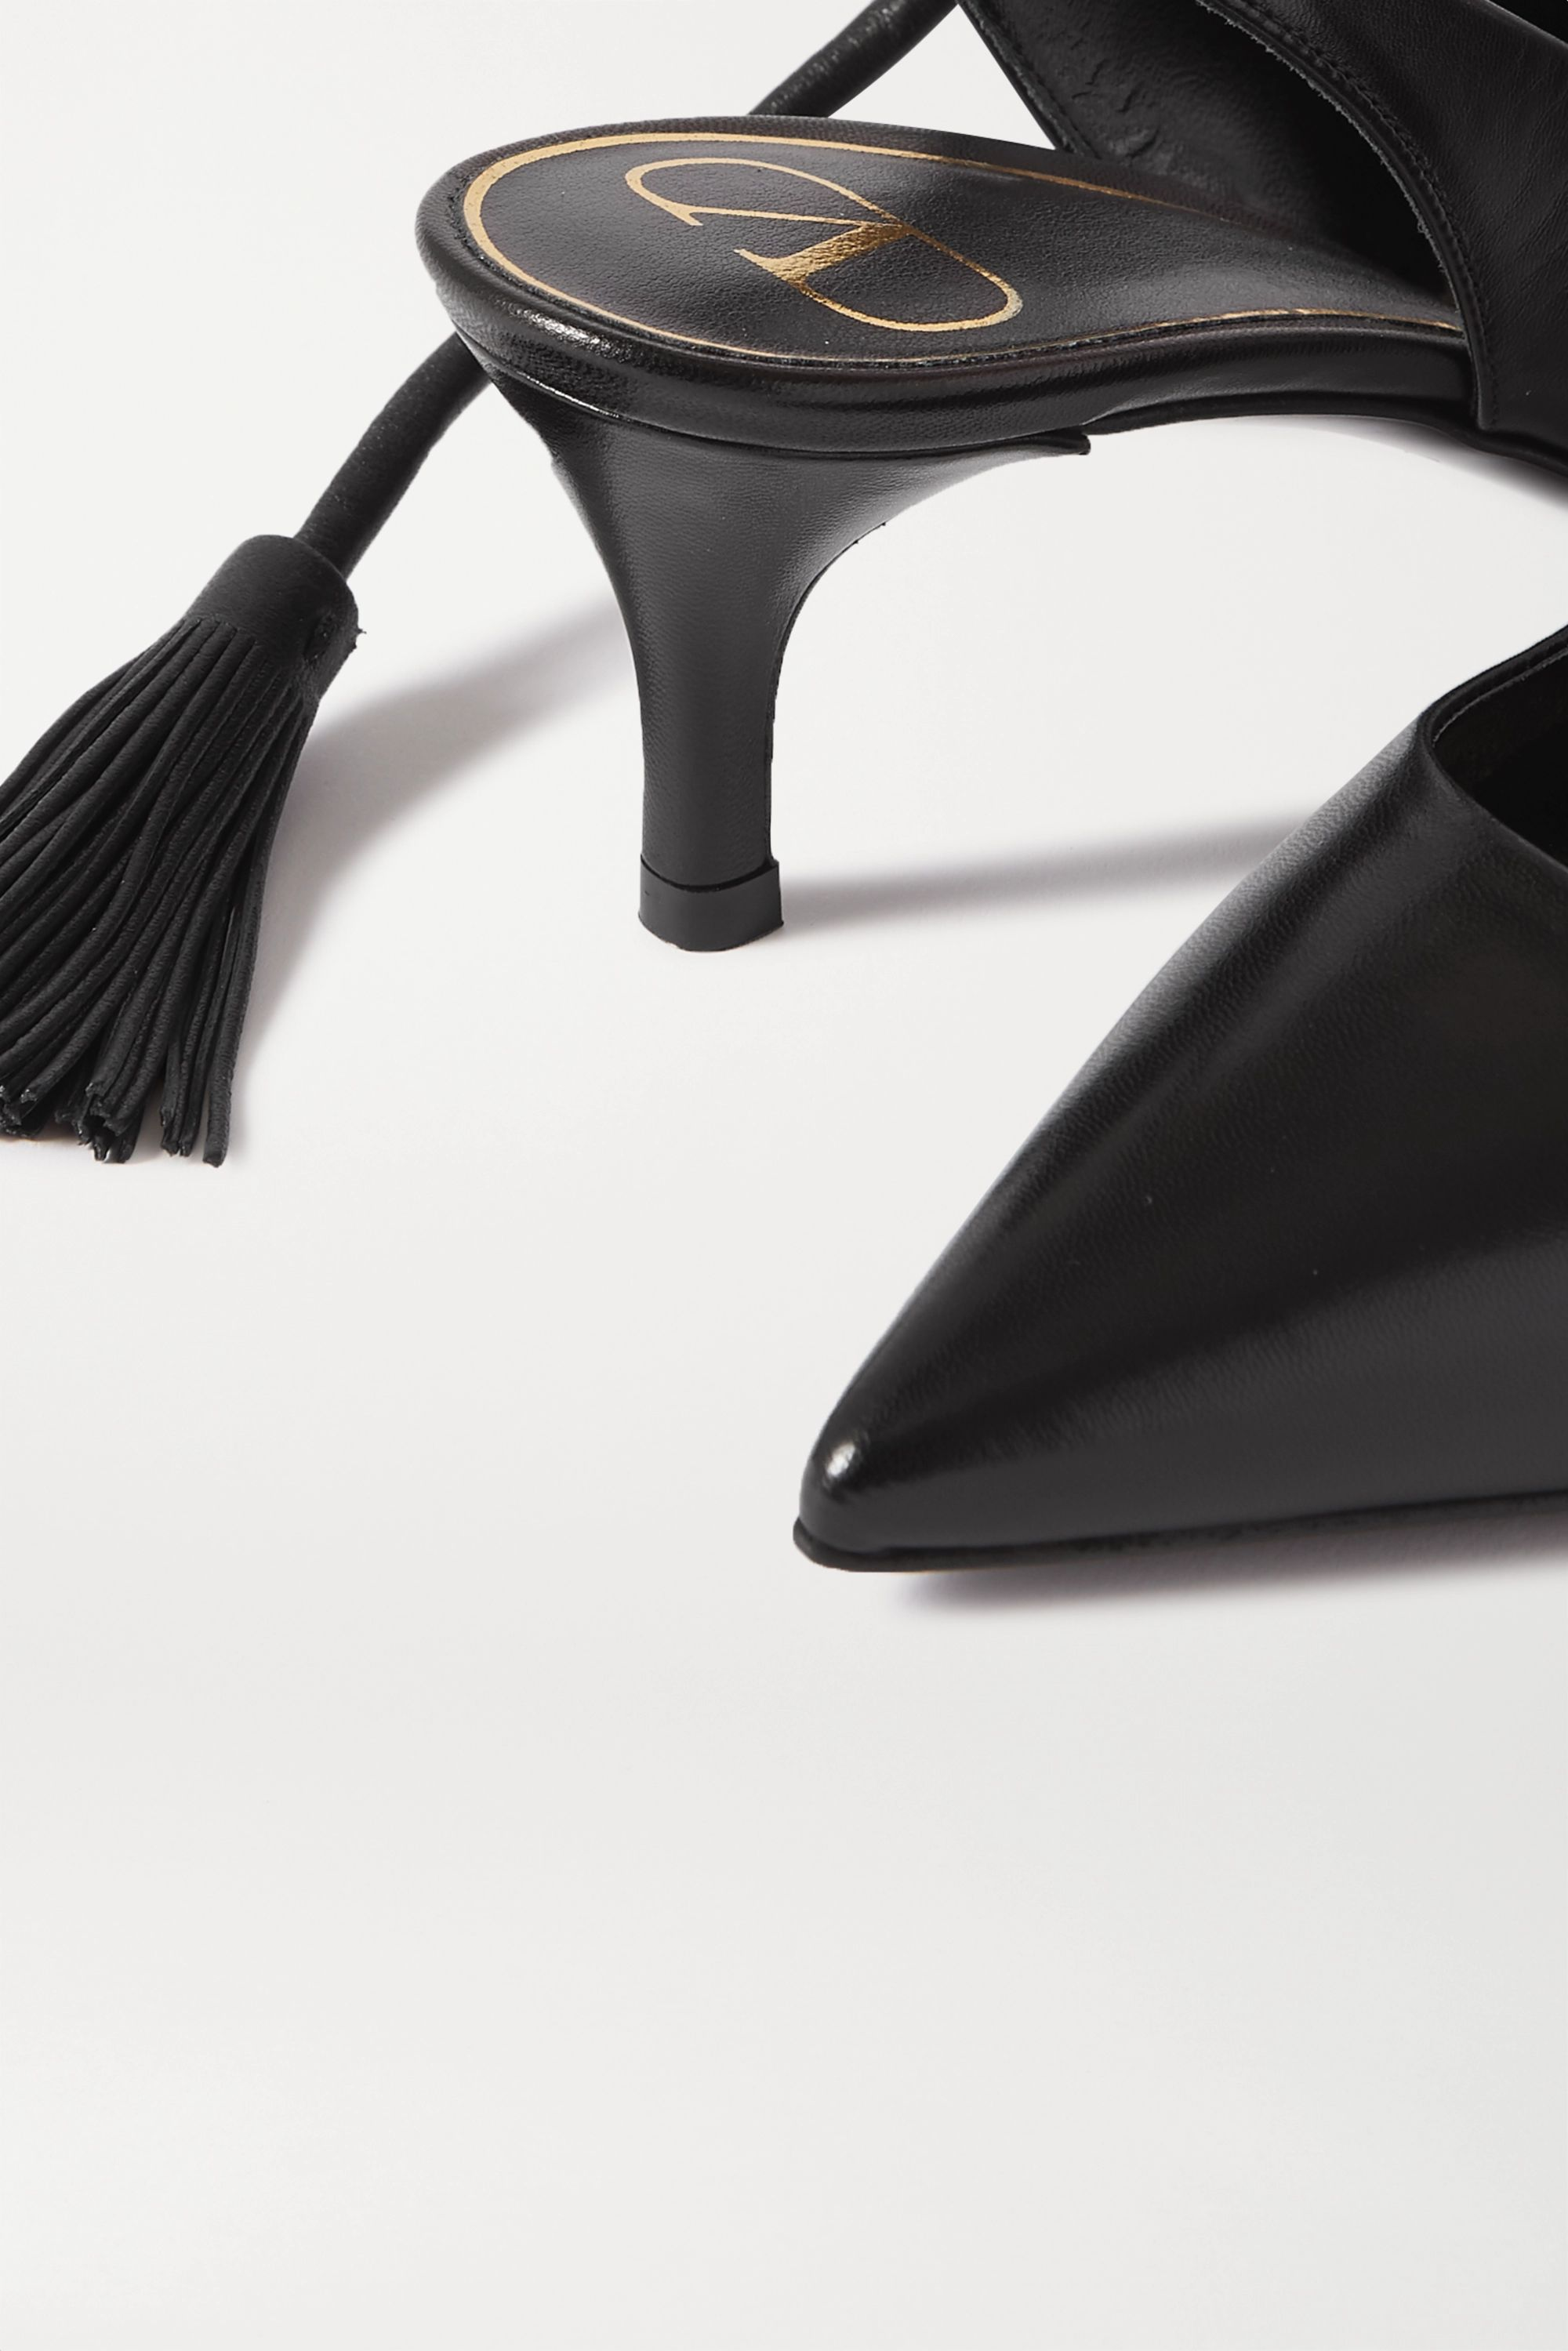 Valentino Valentino Garavani Rockstud Flair 55 leather pumps